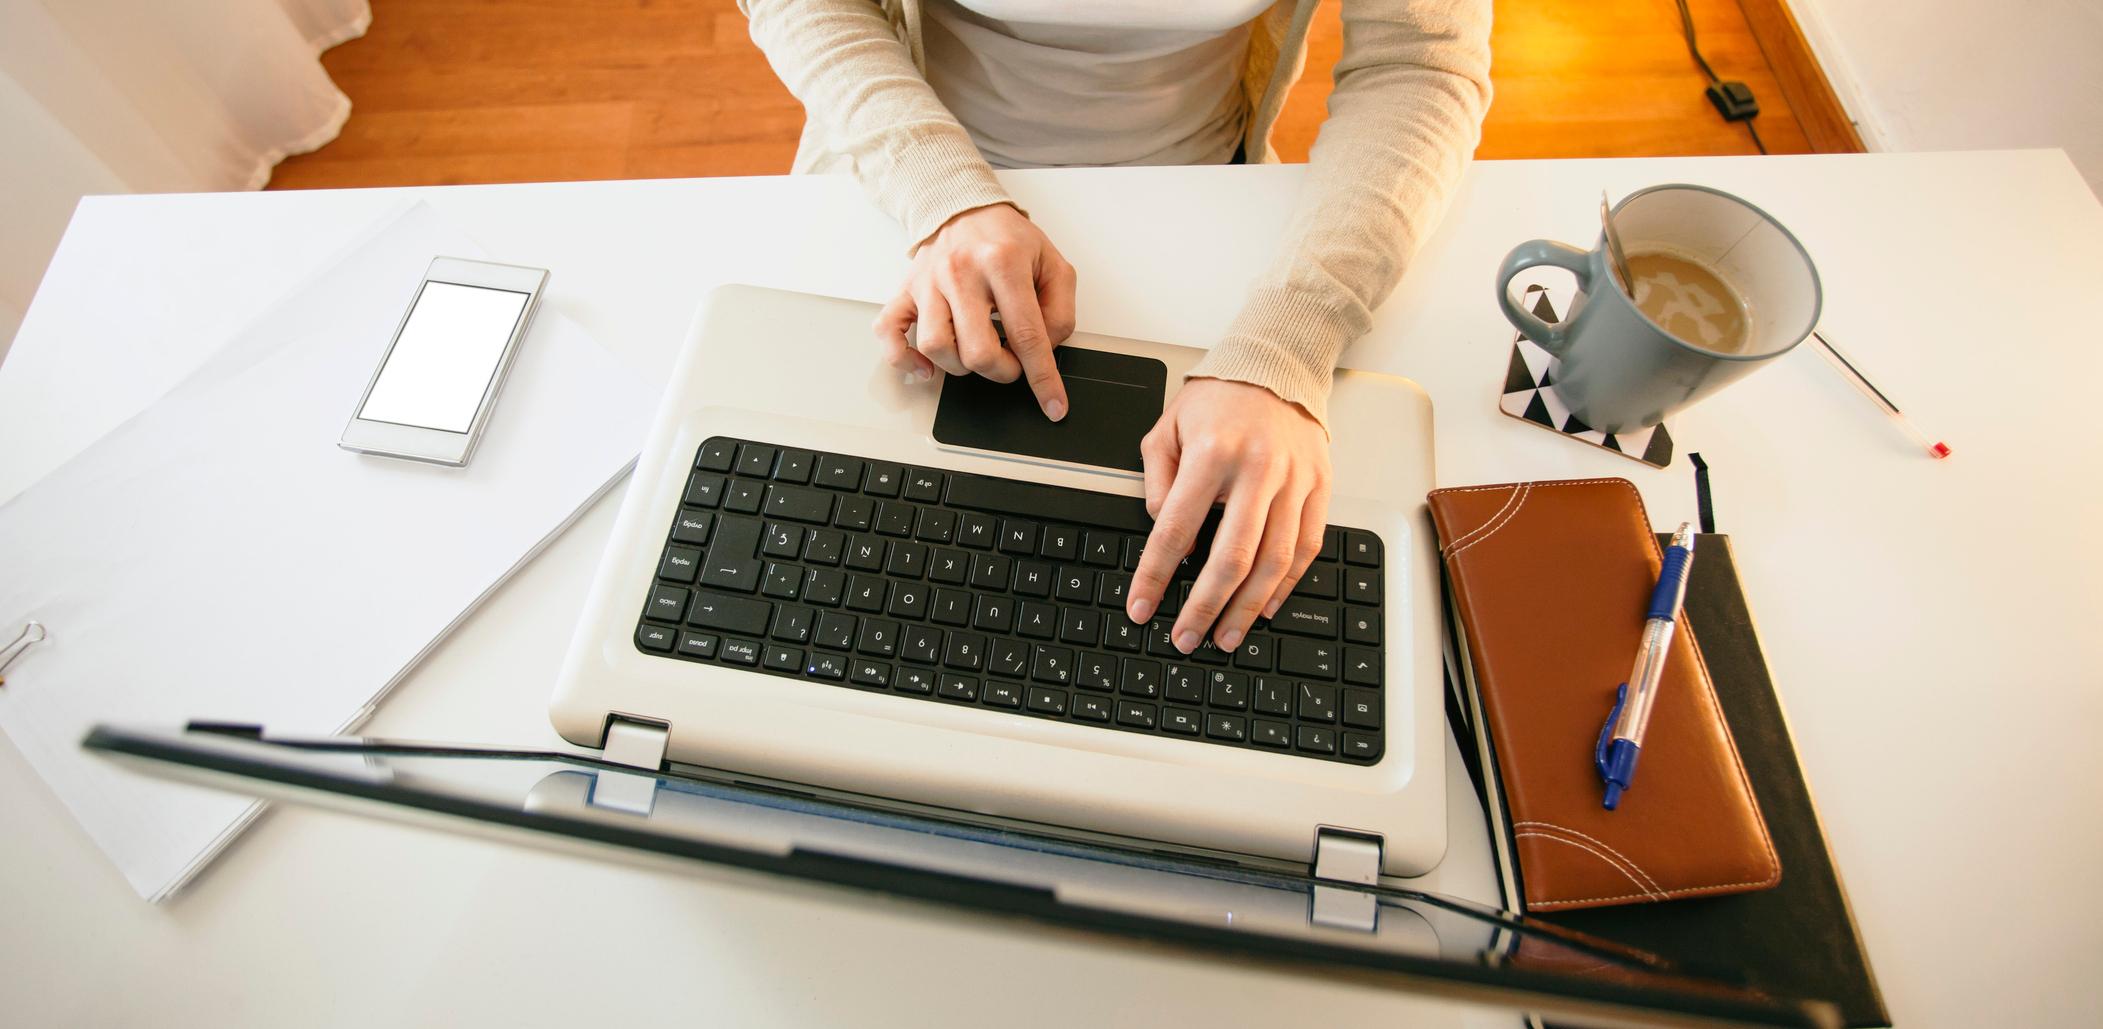 Resume Writing Tips Military Authority Resume Writing Articles BIT Journal  Articles On Resume Writing